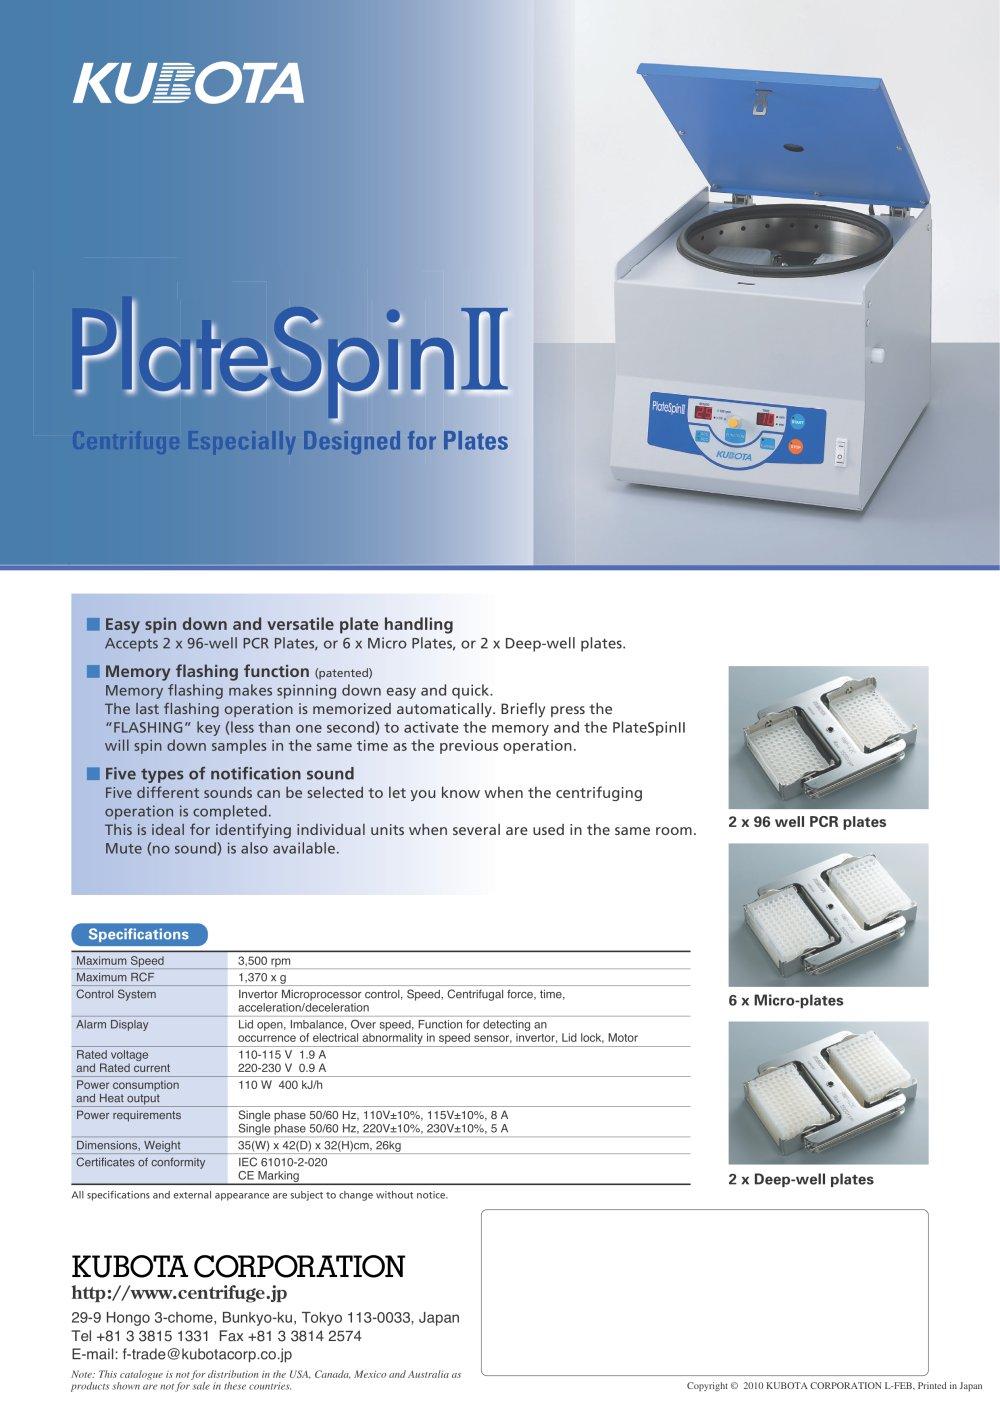 plate centrifuge platespin ii kubota pdf catalogue technical rh pdf medicalexpo com